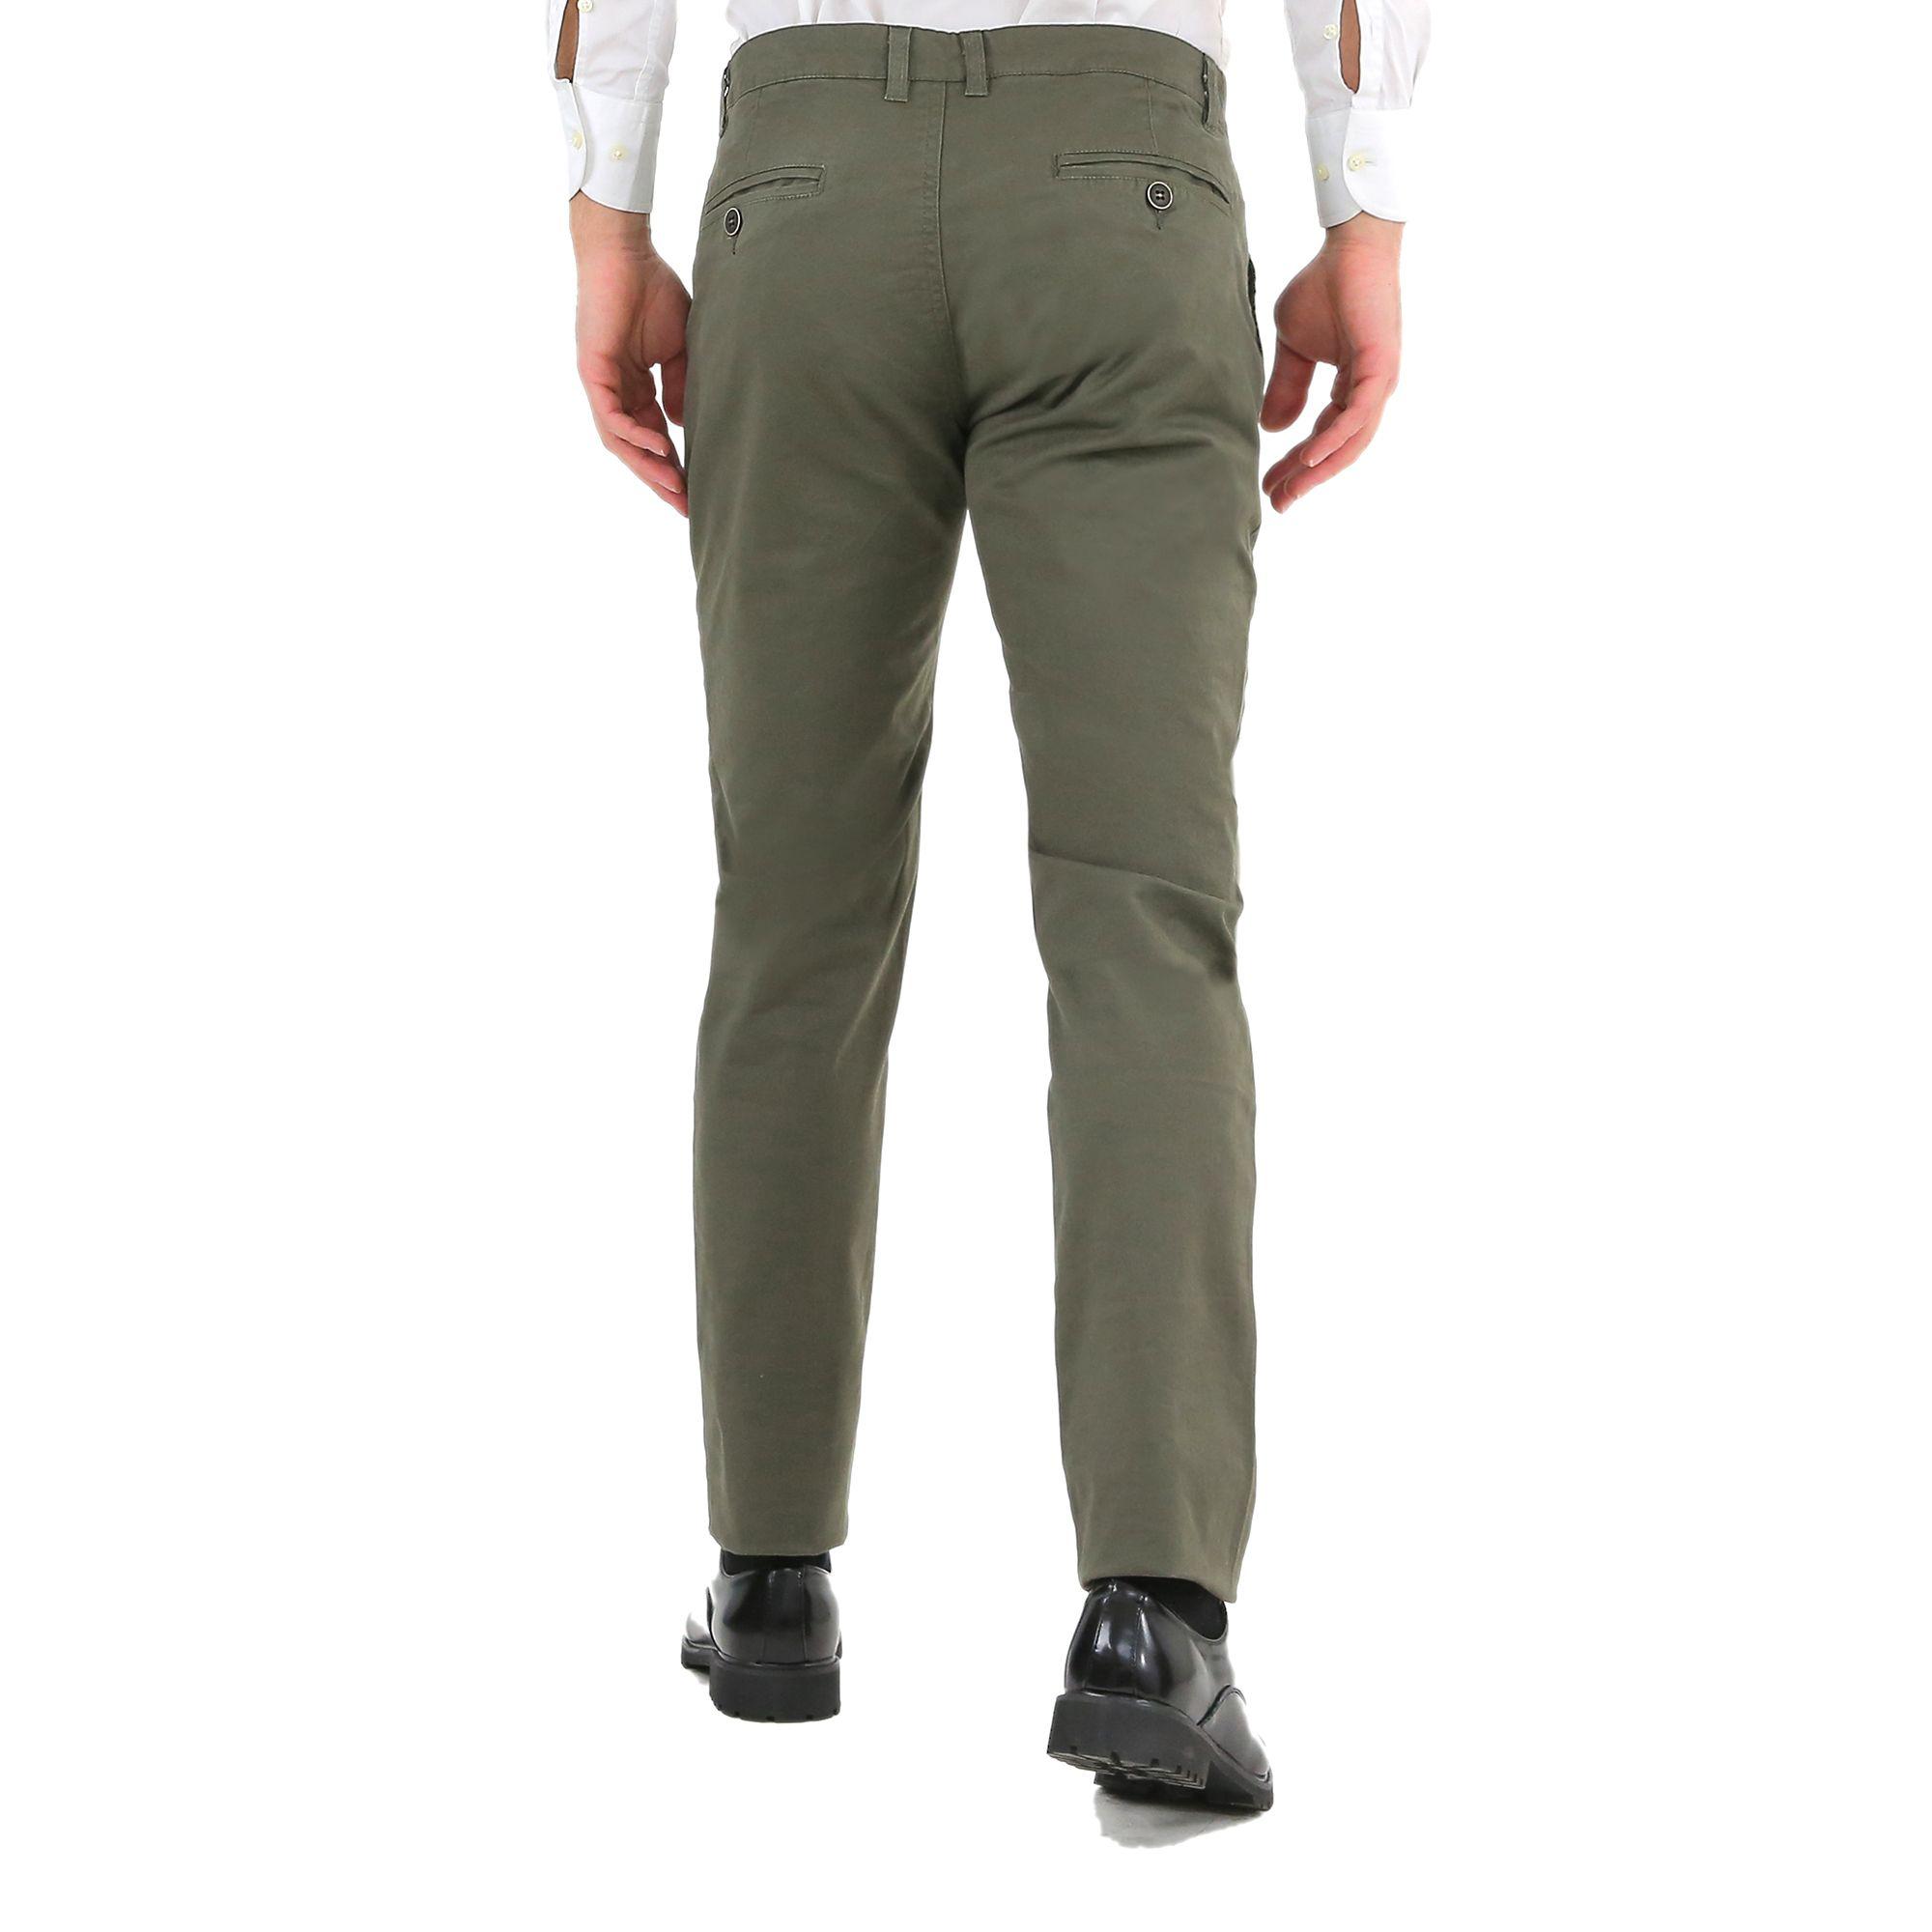 Pantaloni-Uomo-Slim-Fit-Eleganti-Invernali-Cargo-Classico-Chino-Kaki-Tasca-Ameri miniatura 10